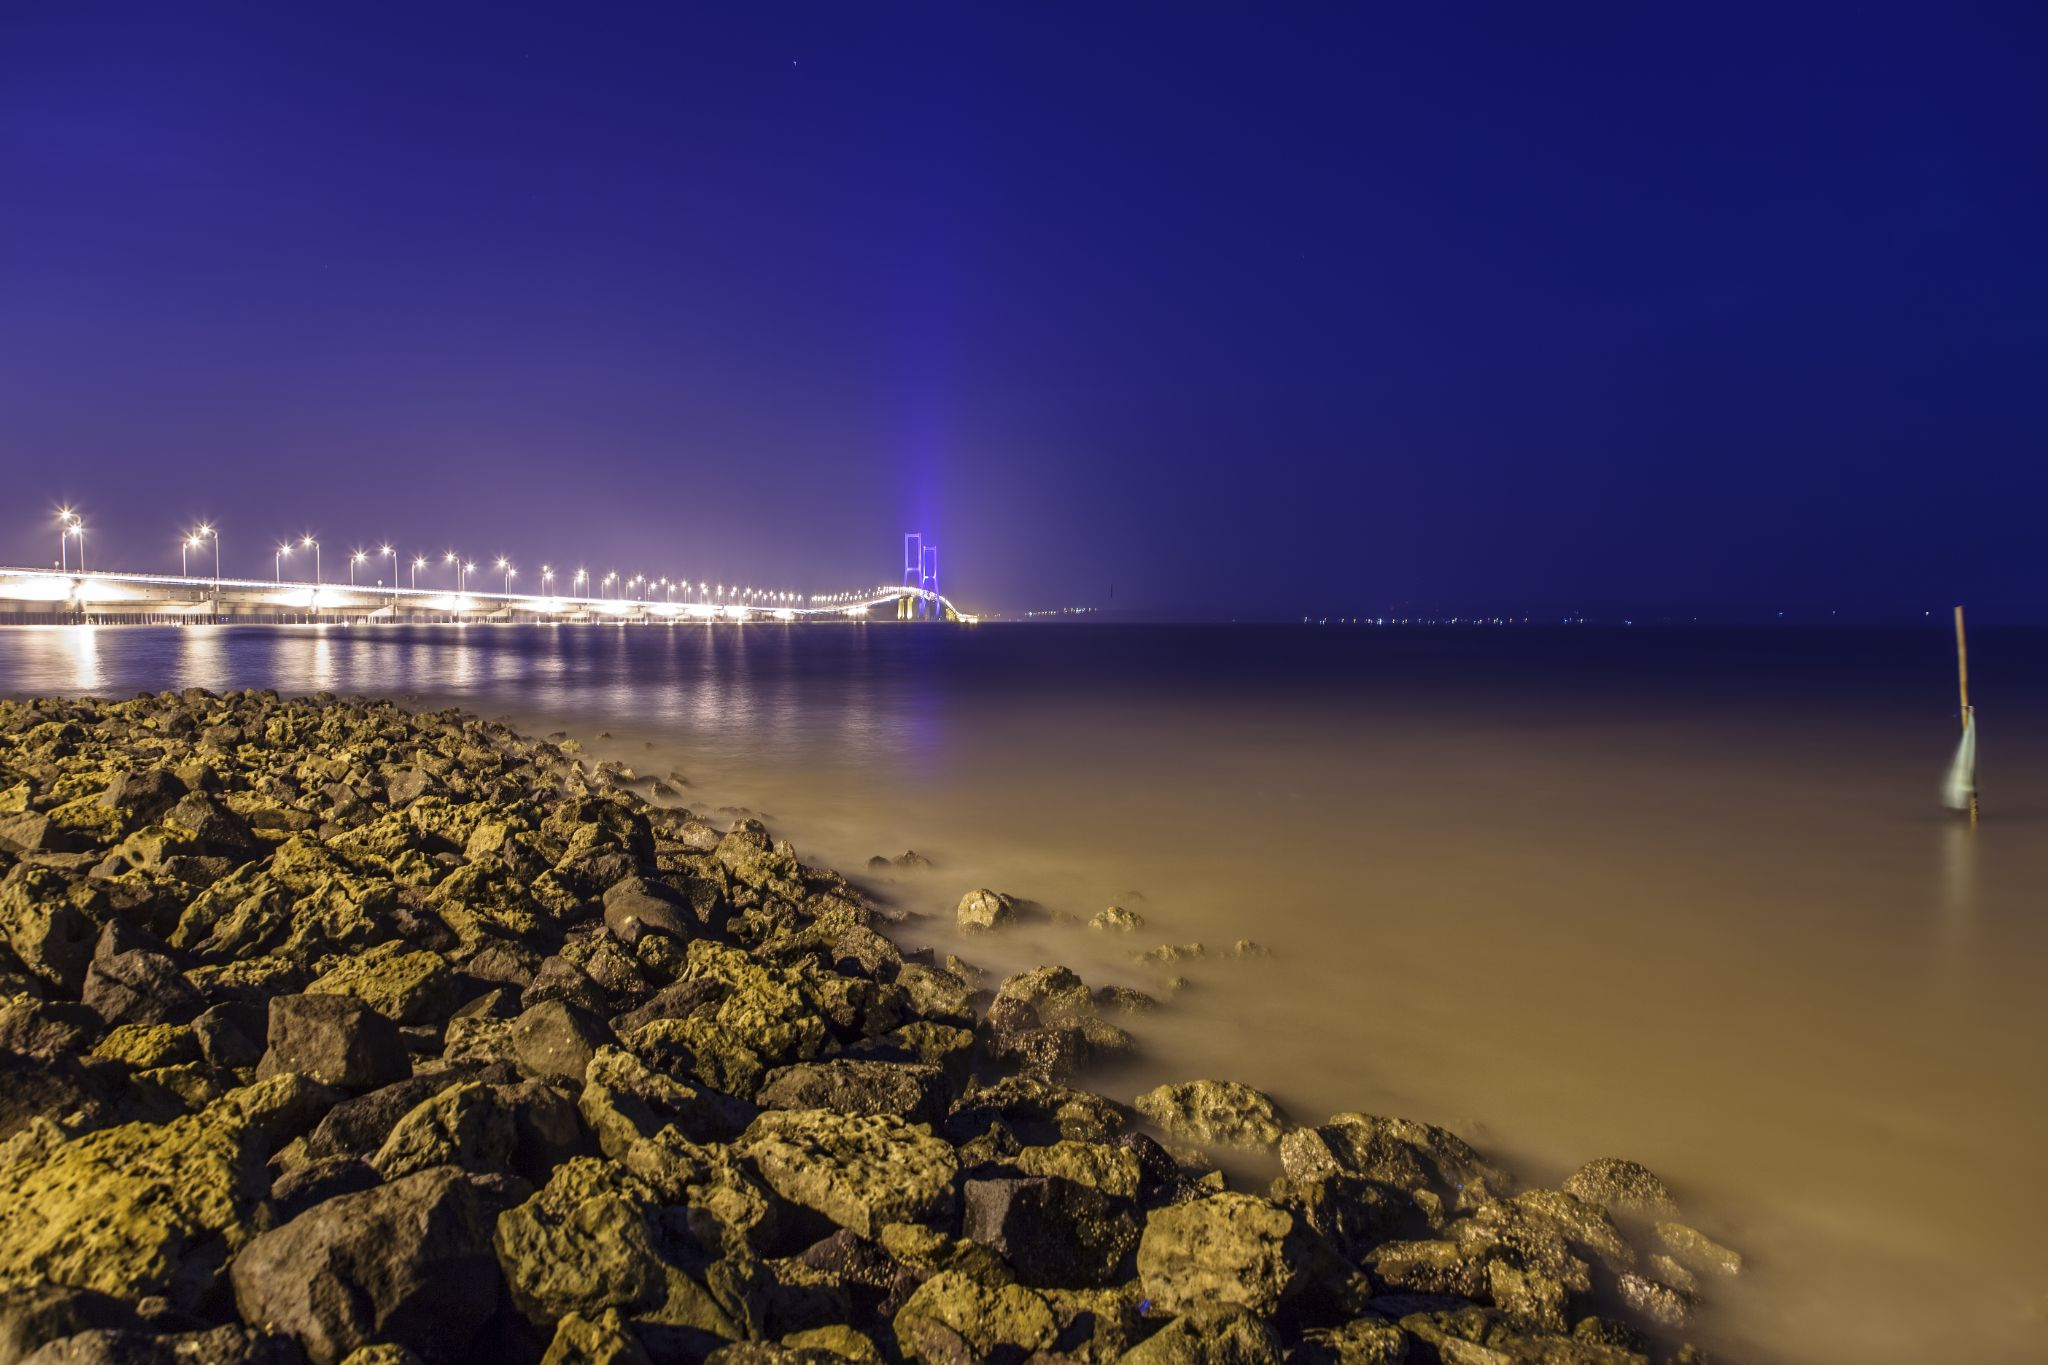 Beautiful long night with bridge. by Dika yudha rio p